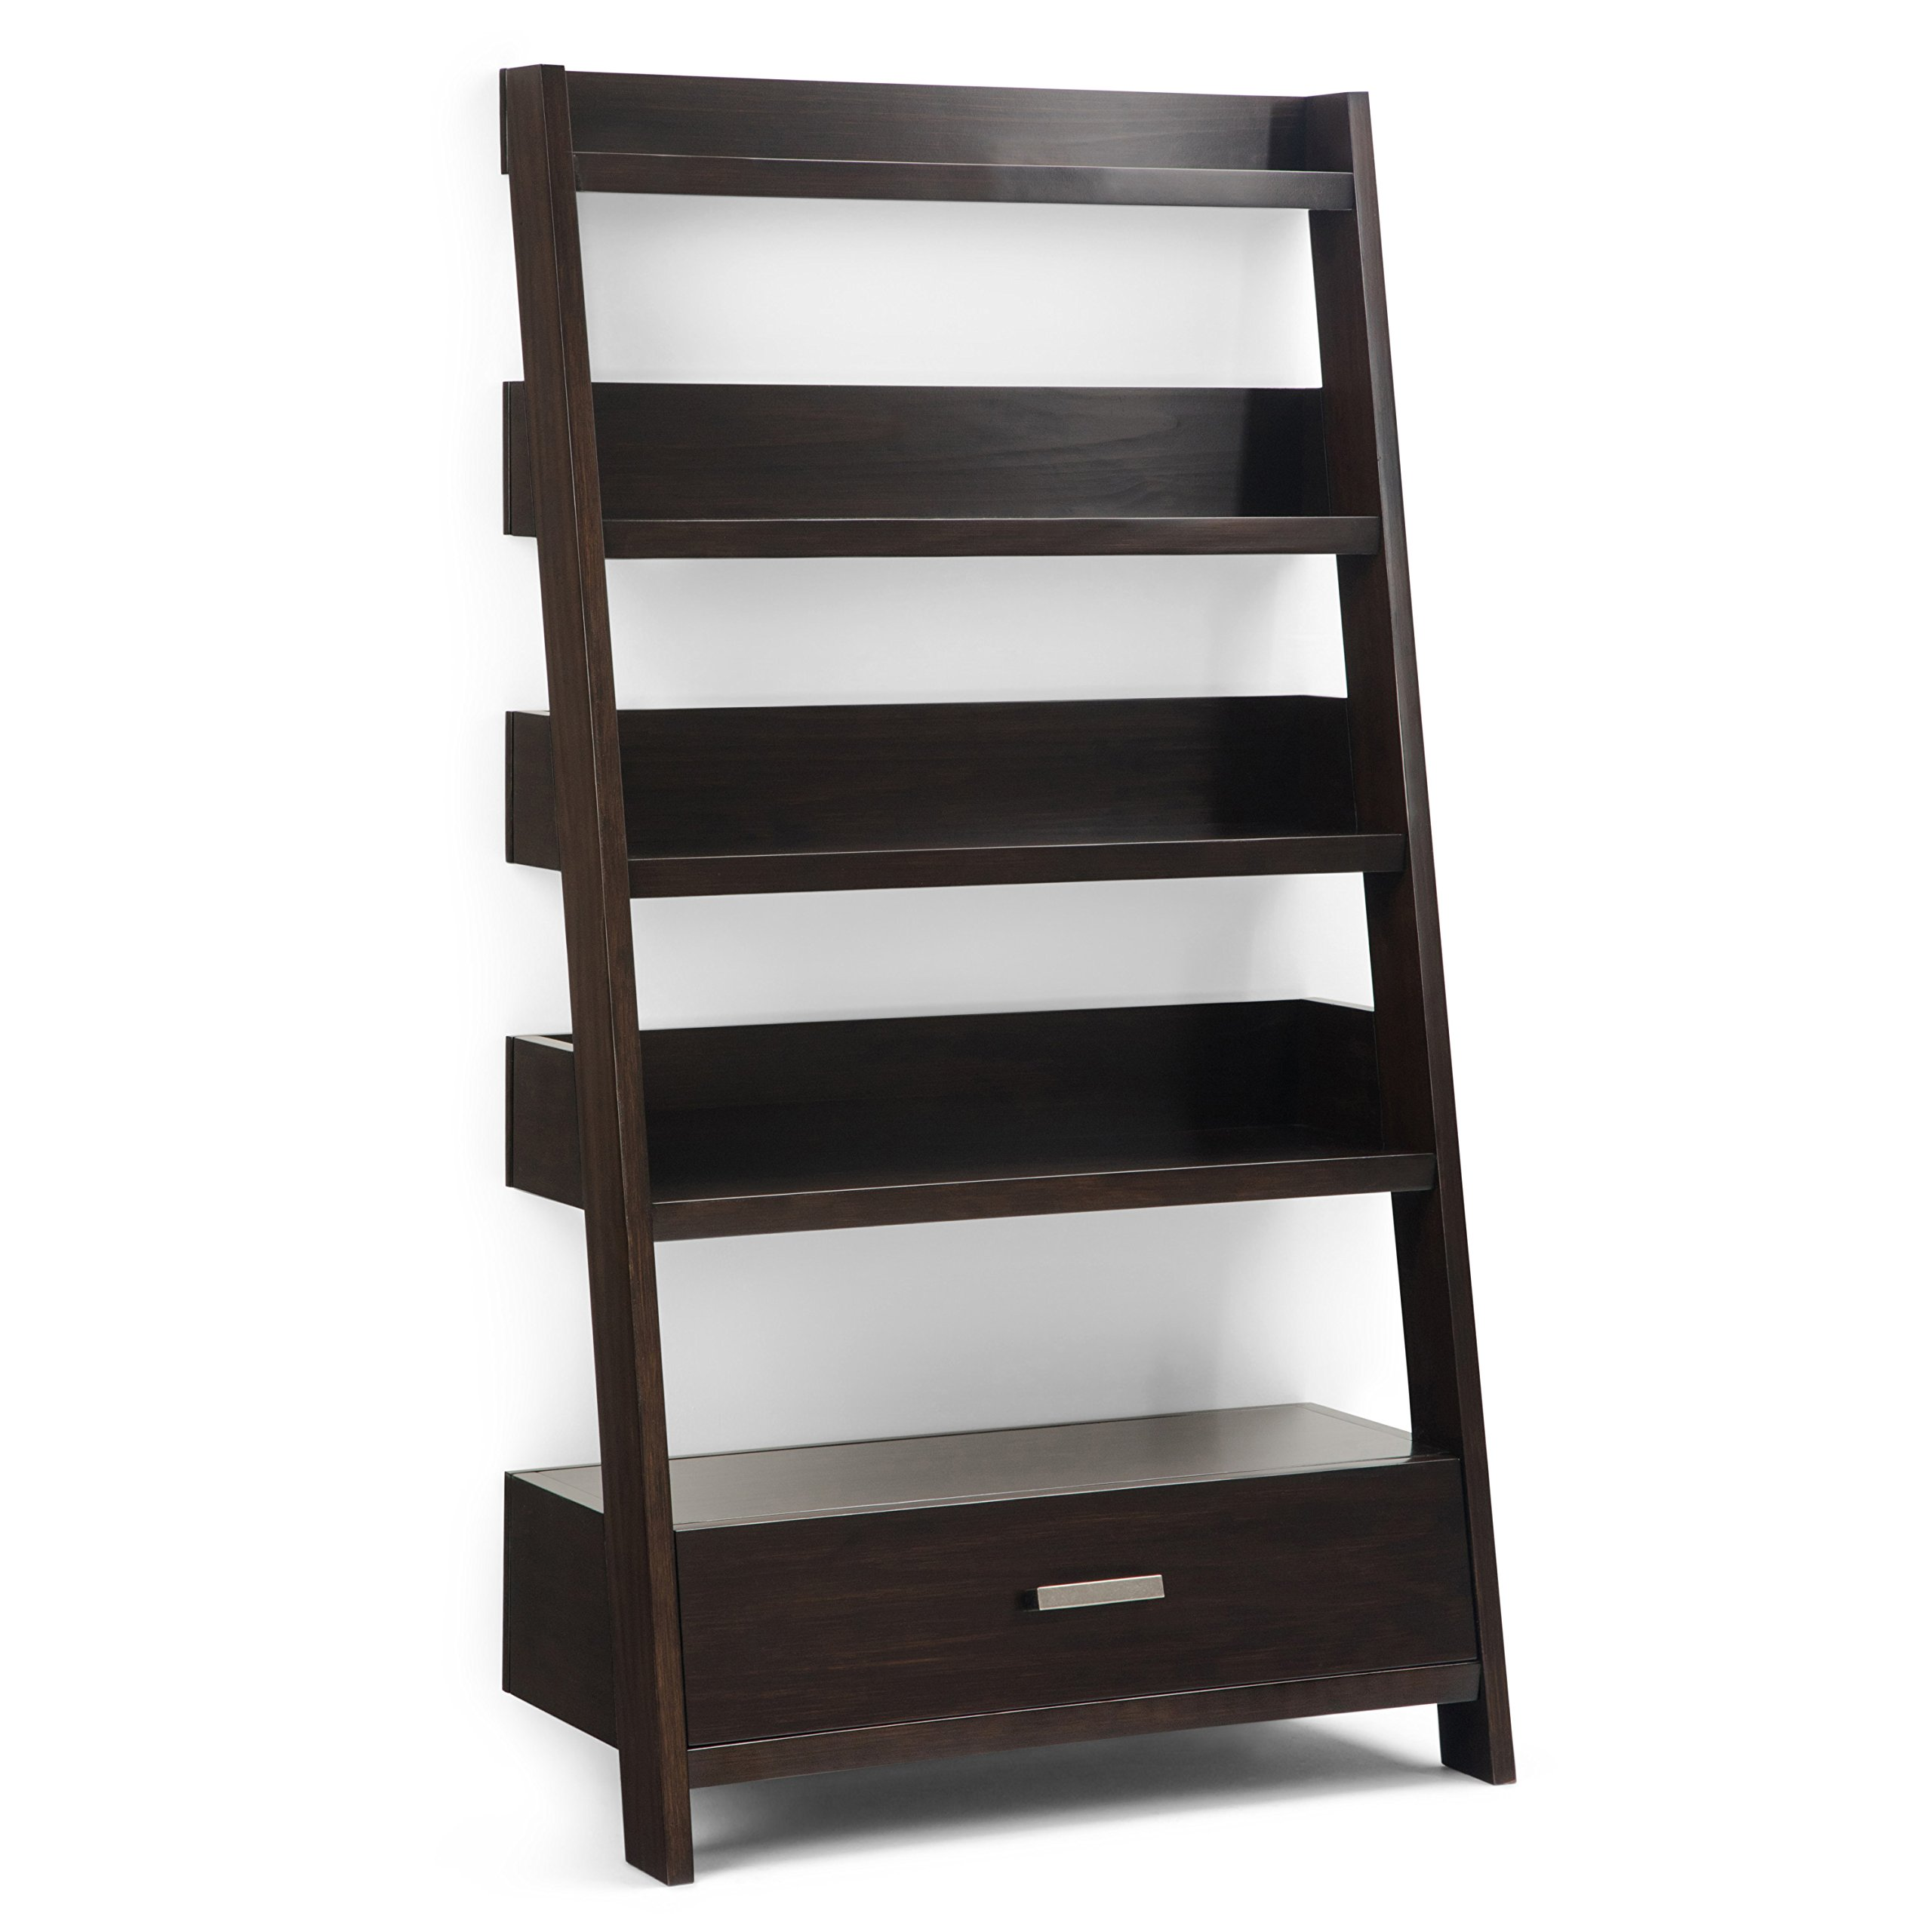 Simpli Home AXCDNA-15-BR Deanna Solid Wood 66 inch x 36 inch Contemporary Ladder Shelf in Dark Chestnut Brown